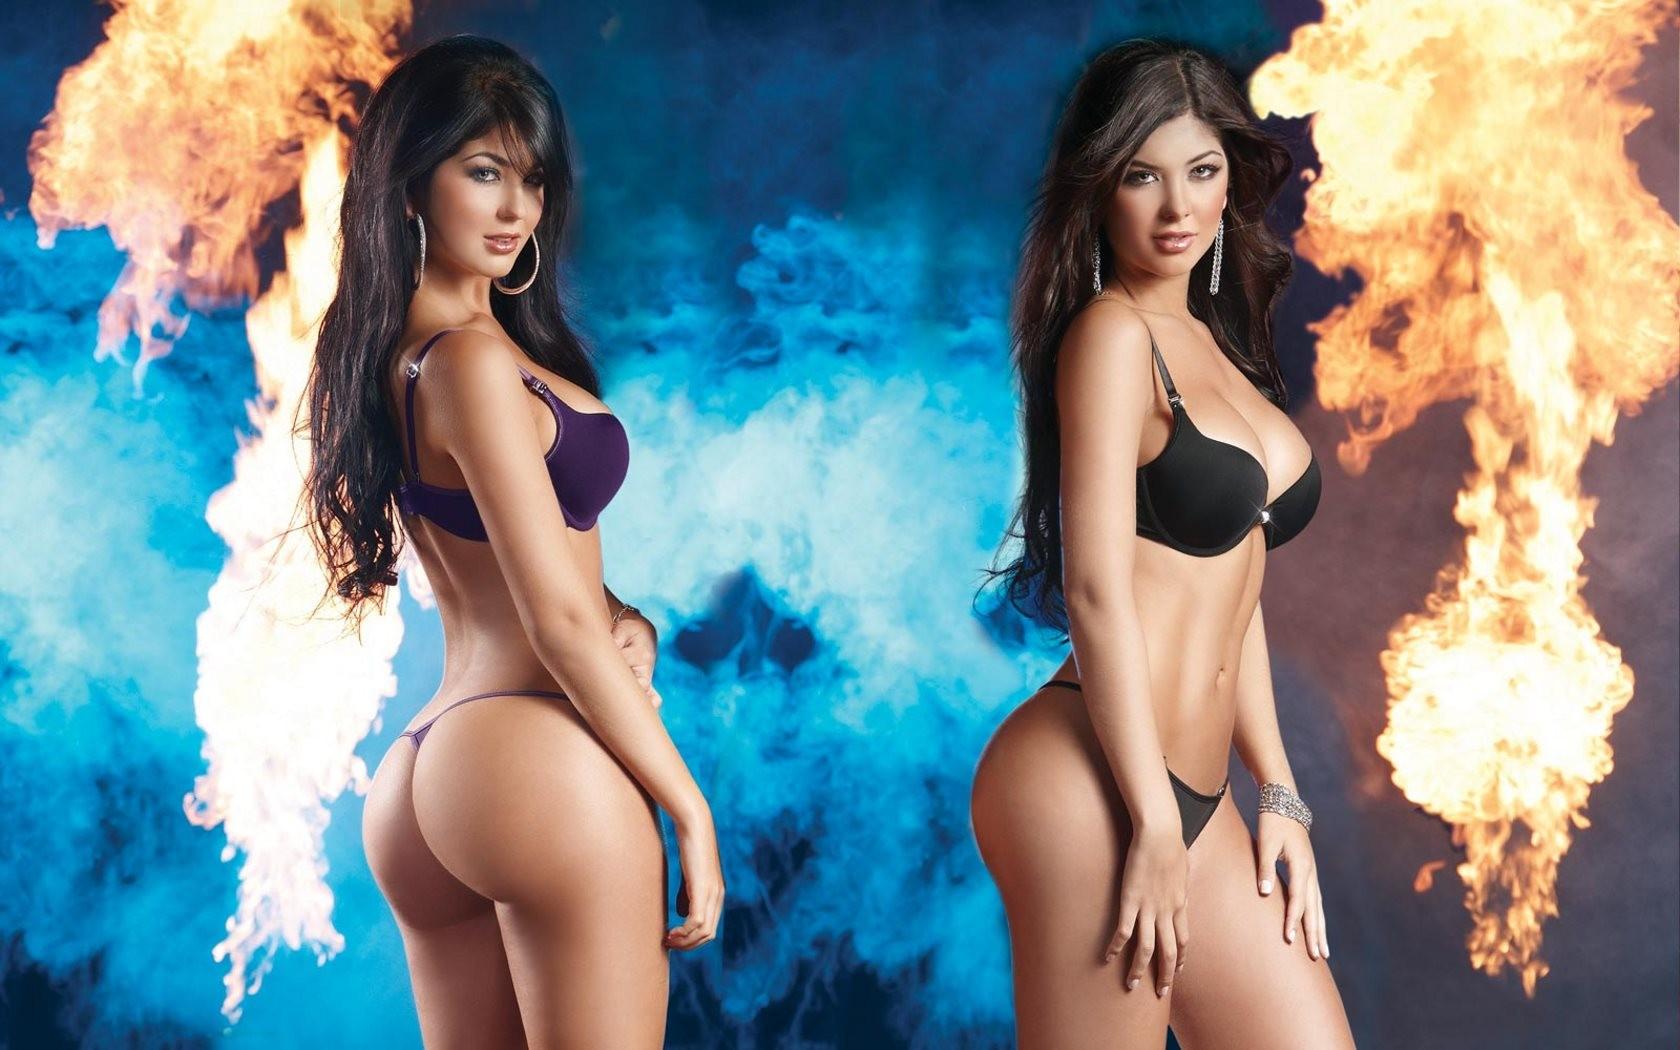 Davalos Twins, Photo Album By Ahzan